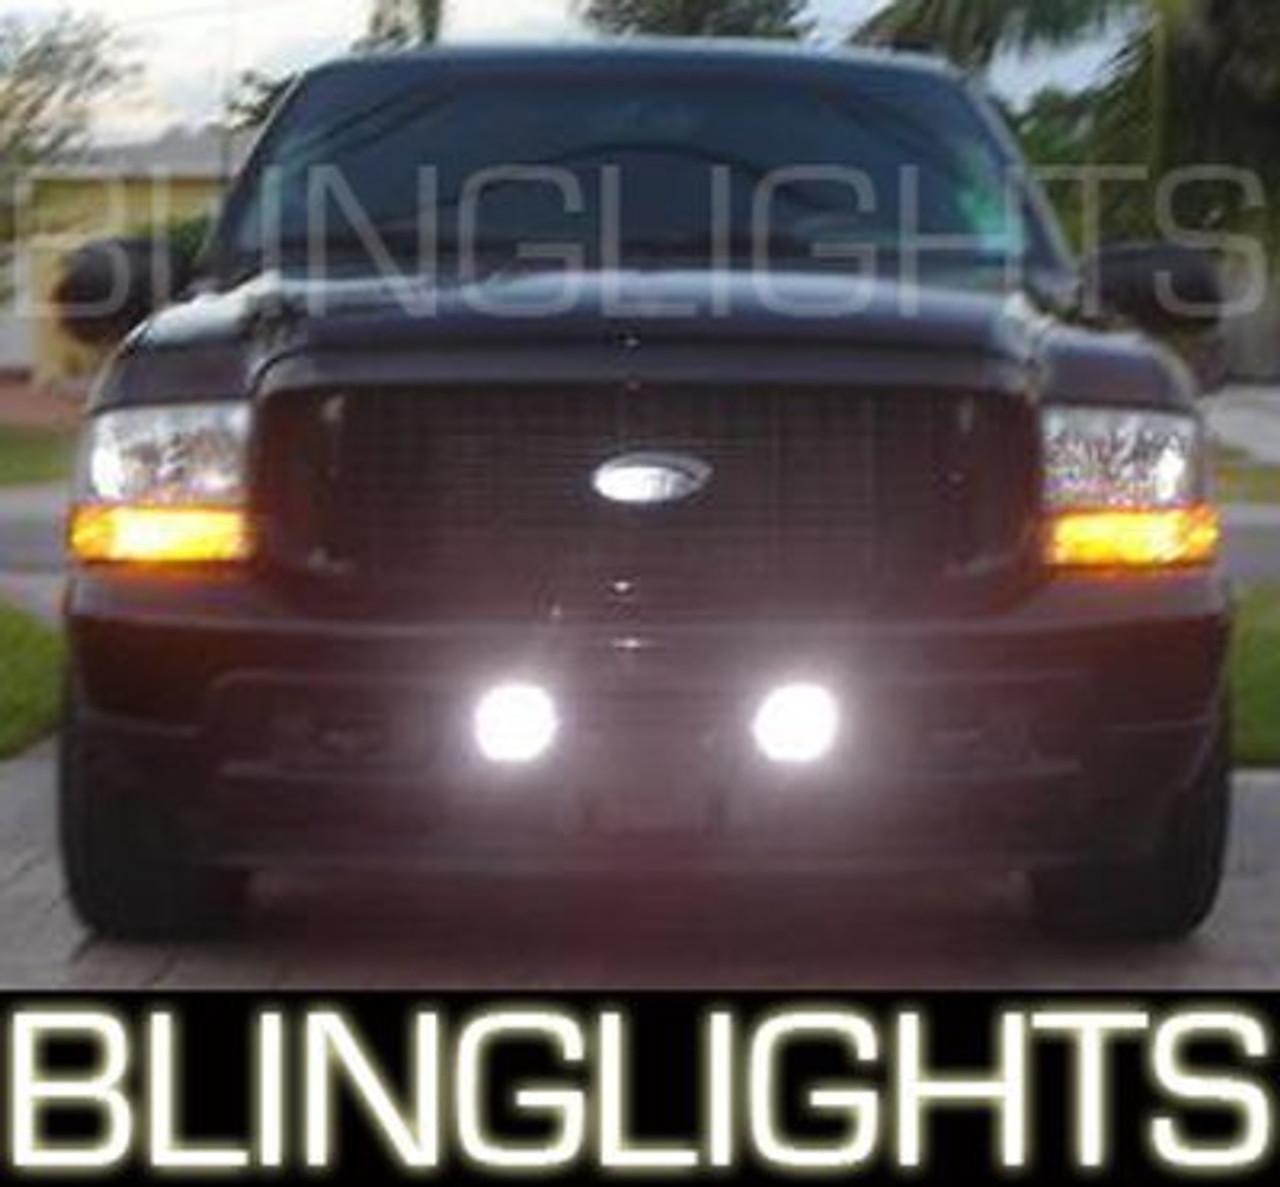 1999 2000 2001 2002 2003 2004 2005 2006 2007 Ford F450 Super Duty Xenon Fog Lamps Lights Foglamp Kit